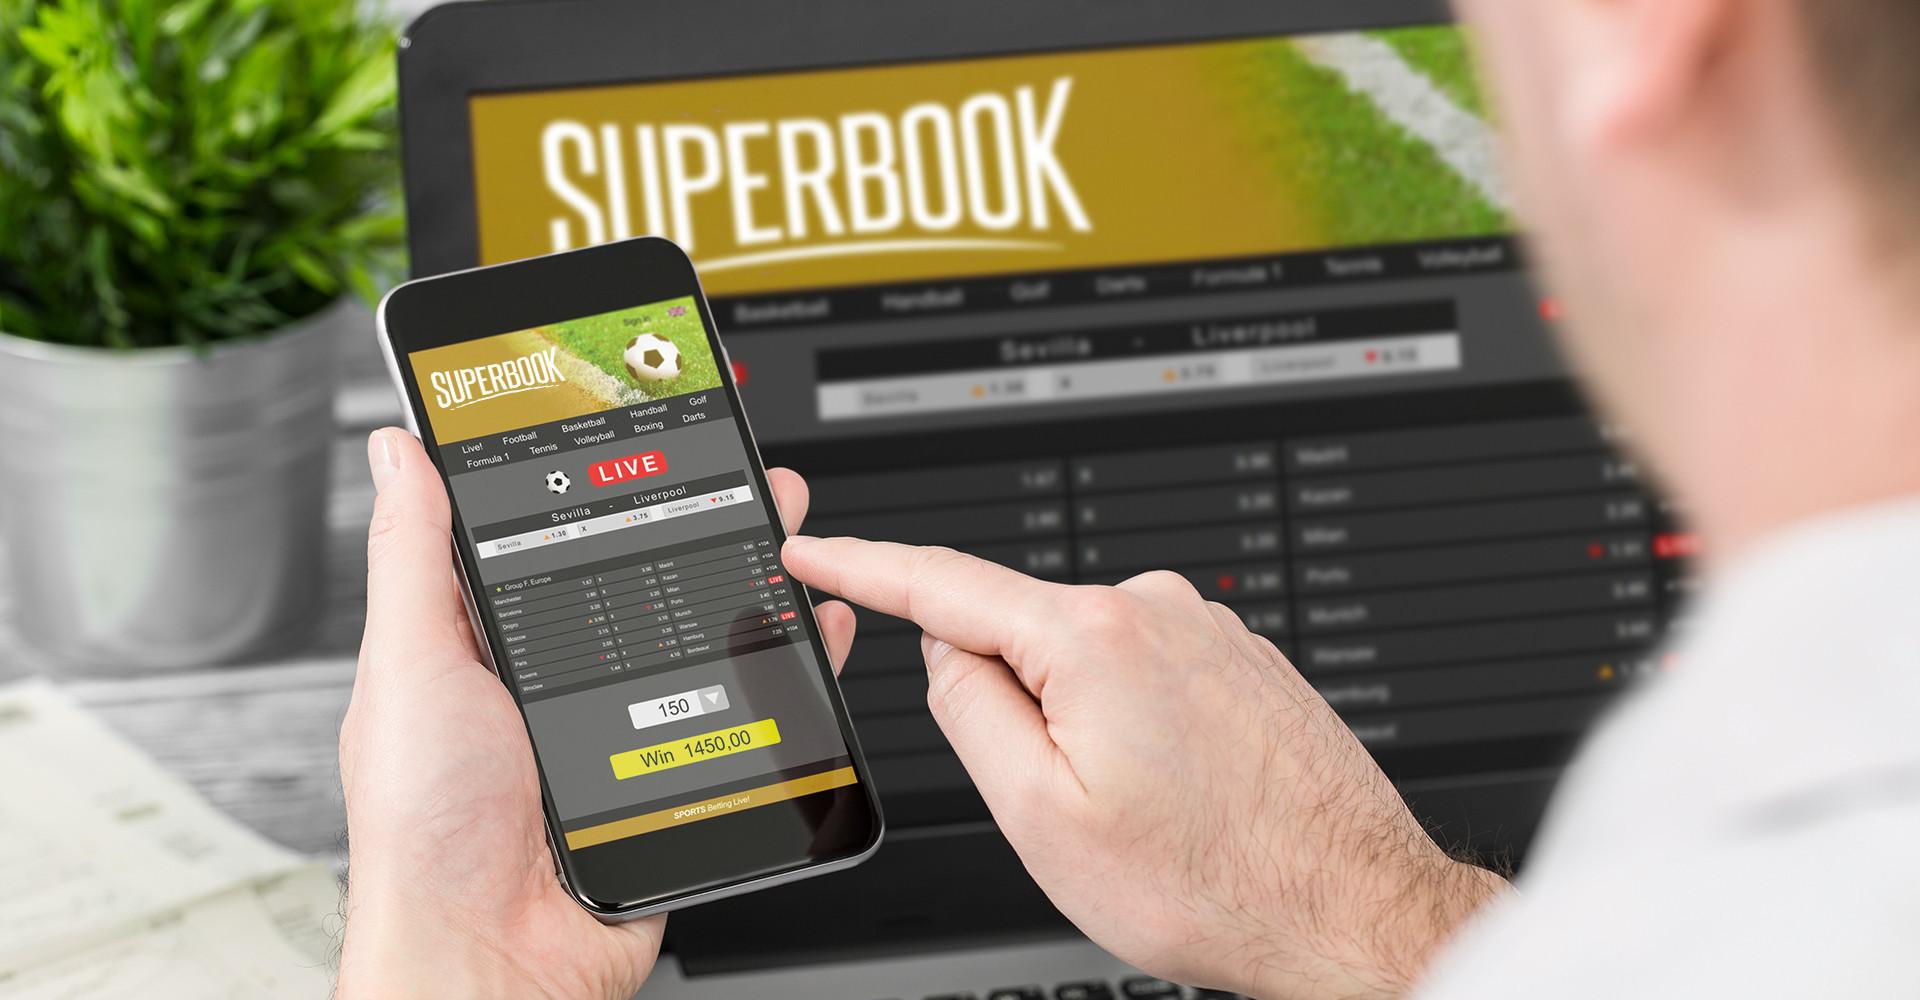 SuperBook Mobile App FAQs at Westgate Las Vegas Resort & Casino